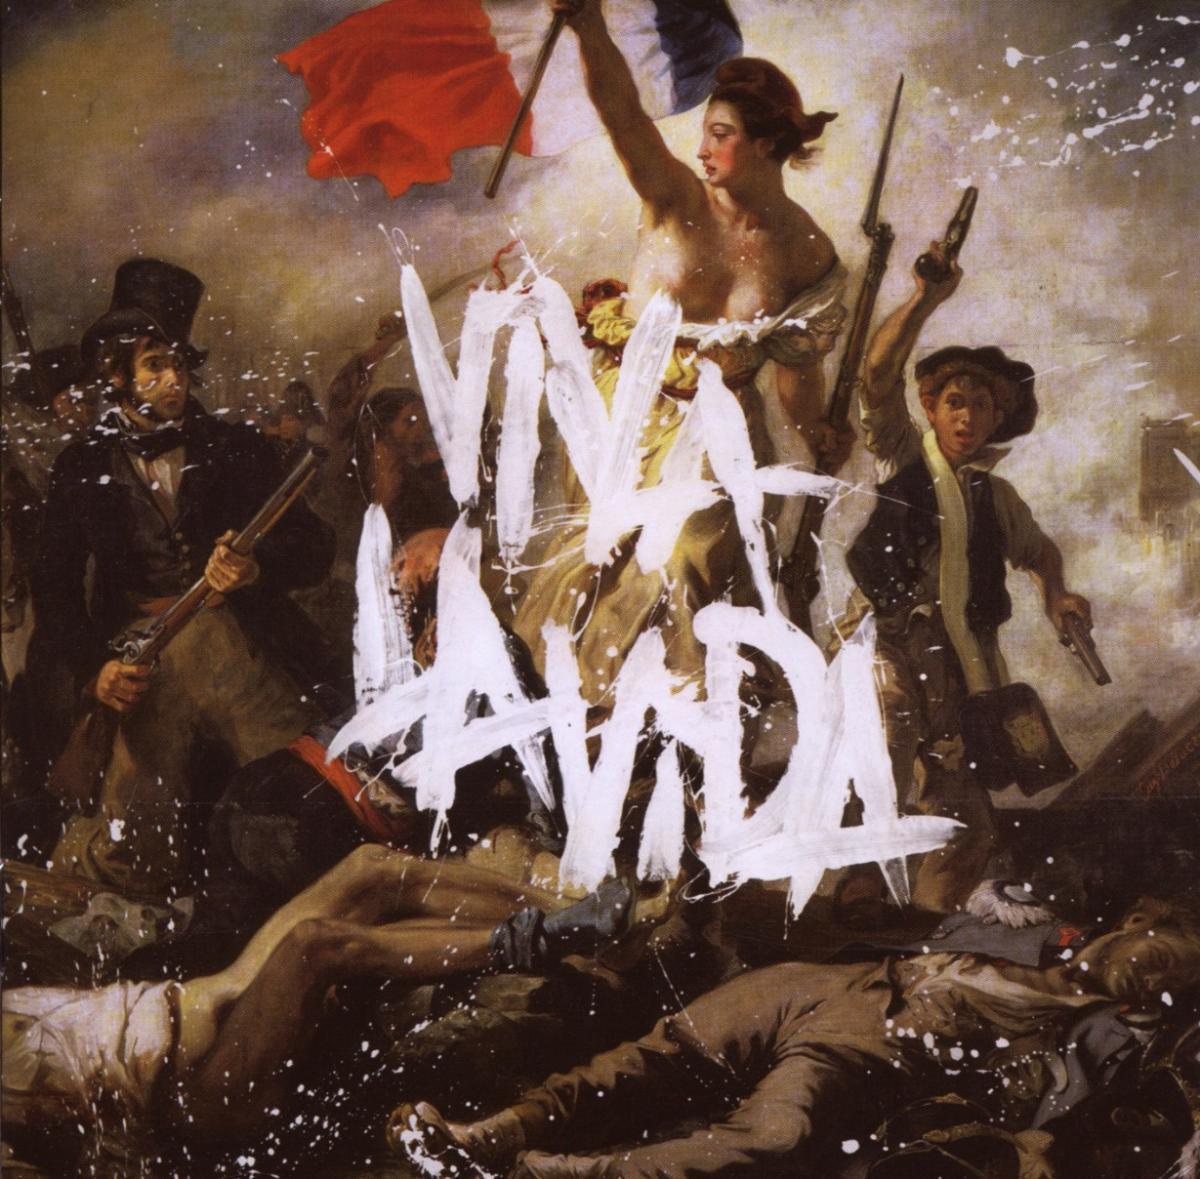 Cover: COLDPLAY, VIVA LA VIDA